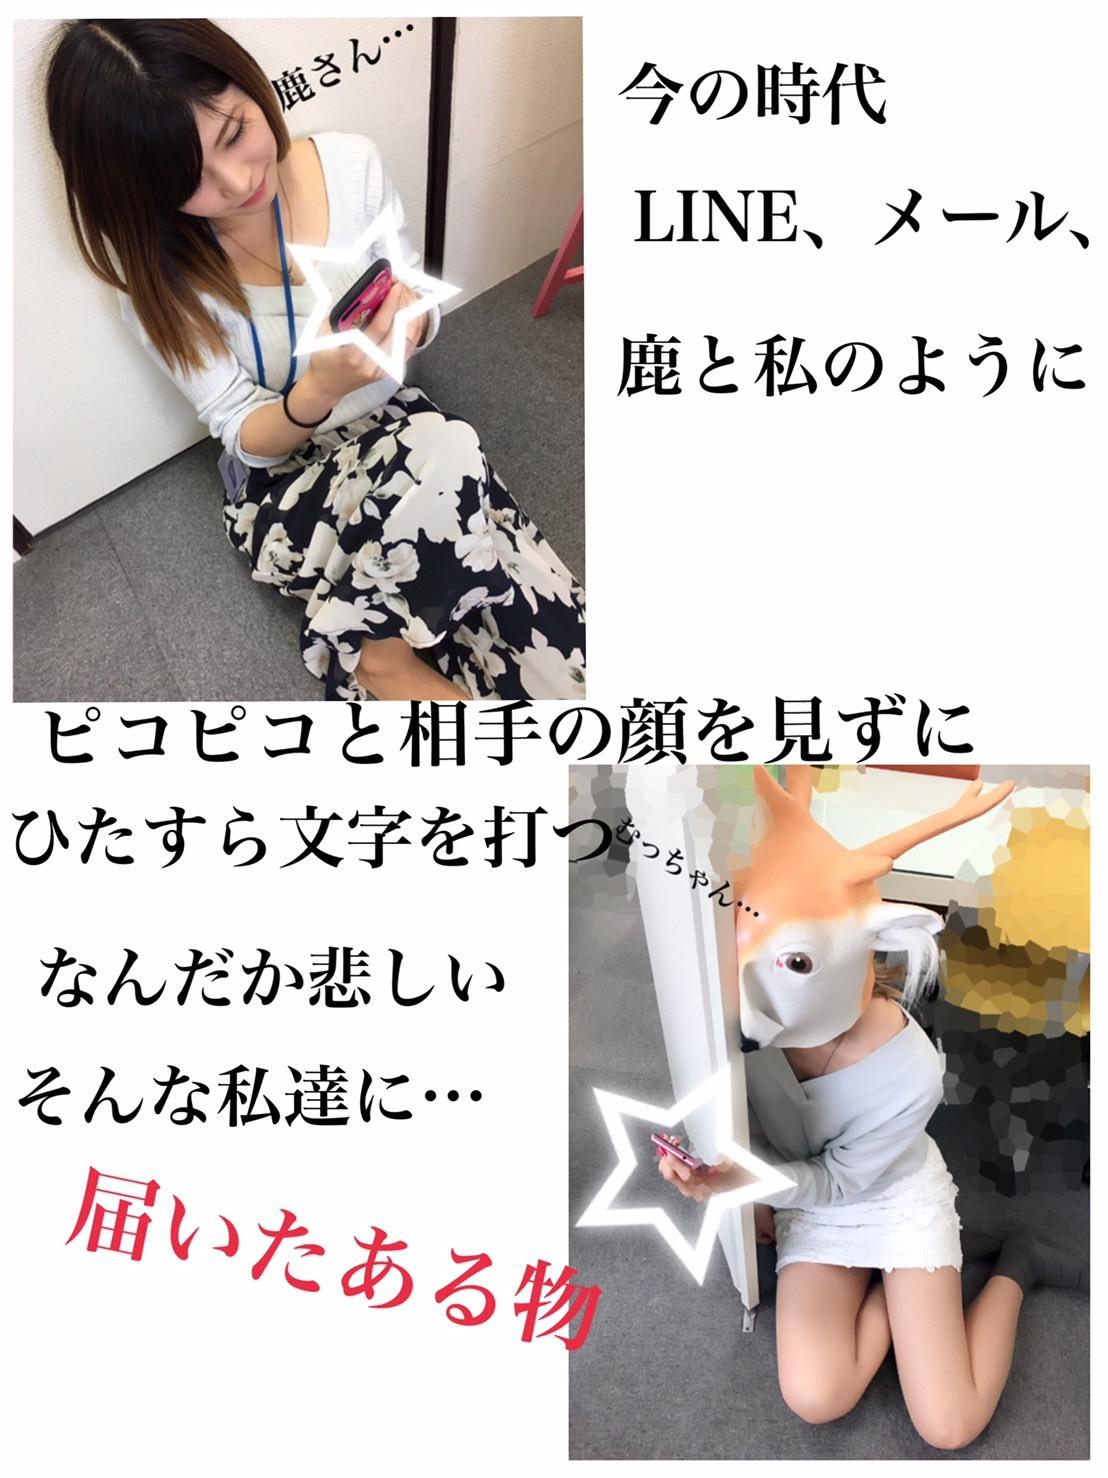 S__3989533.jpg